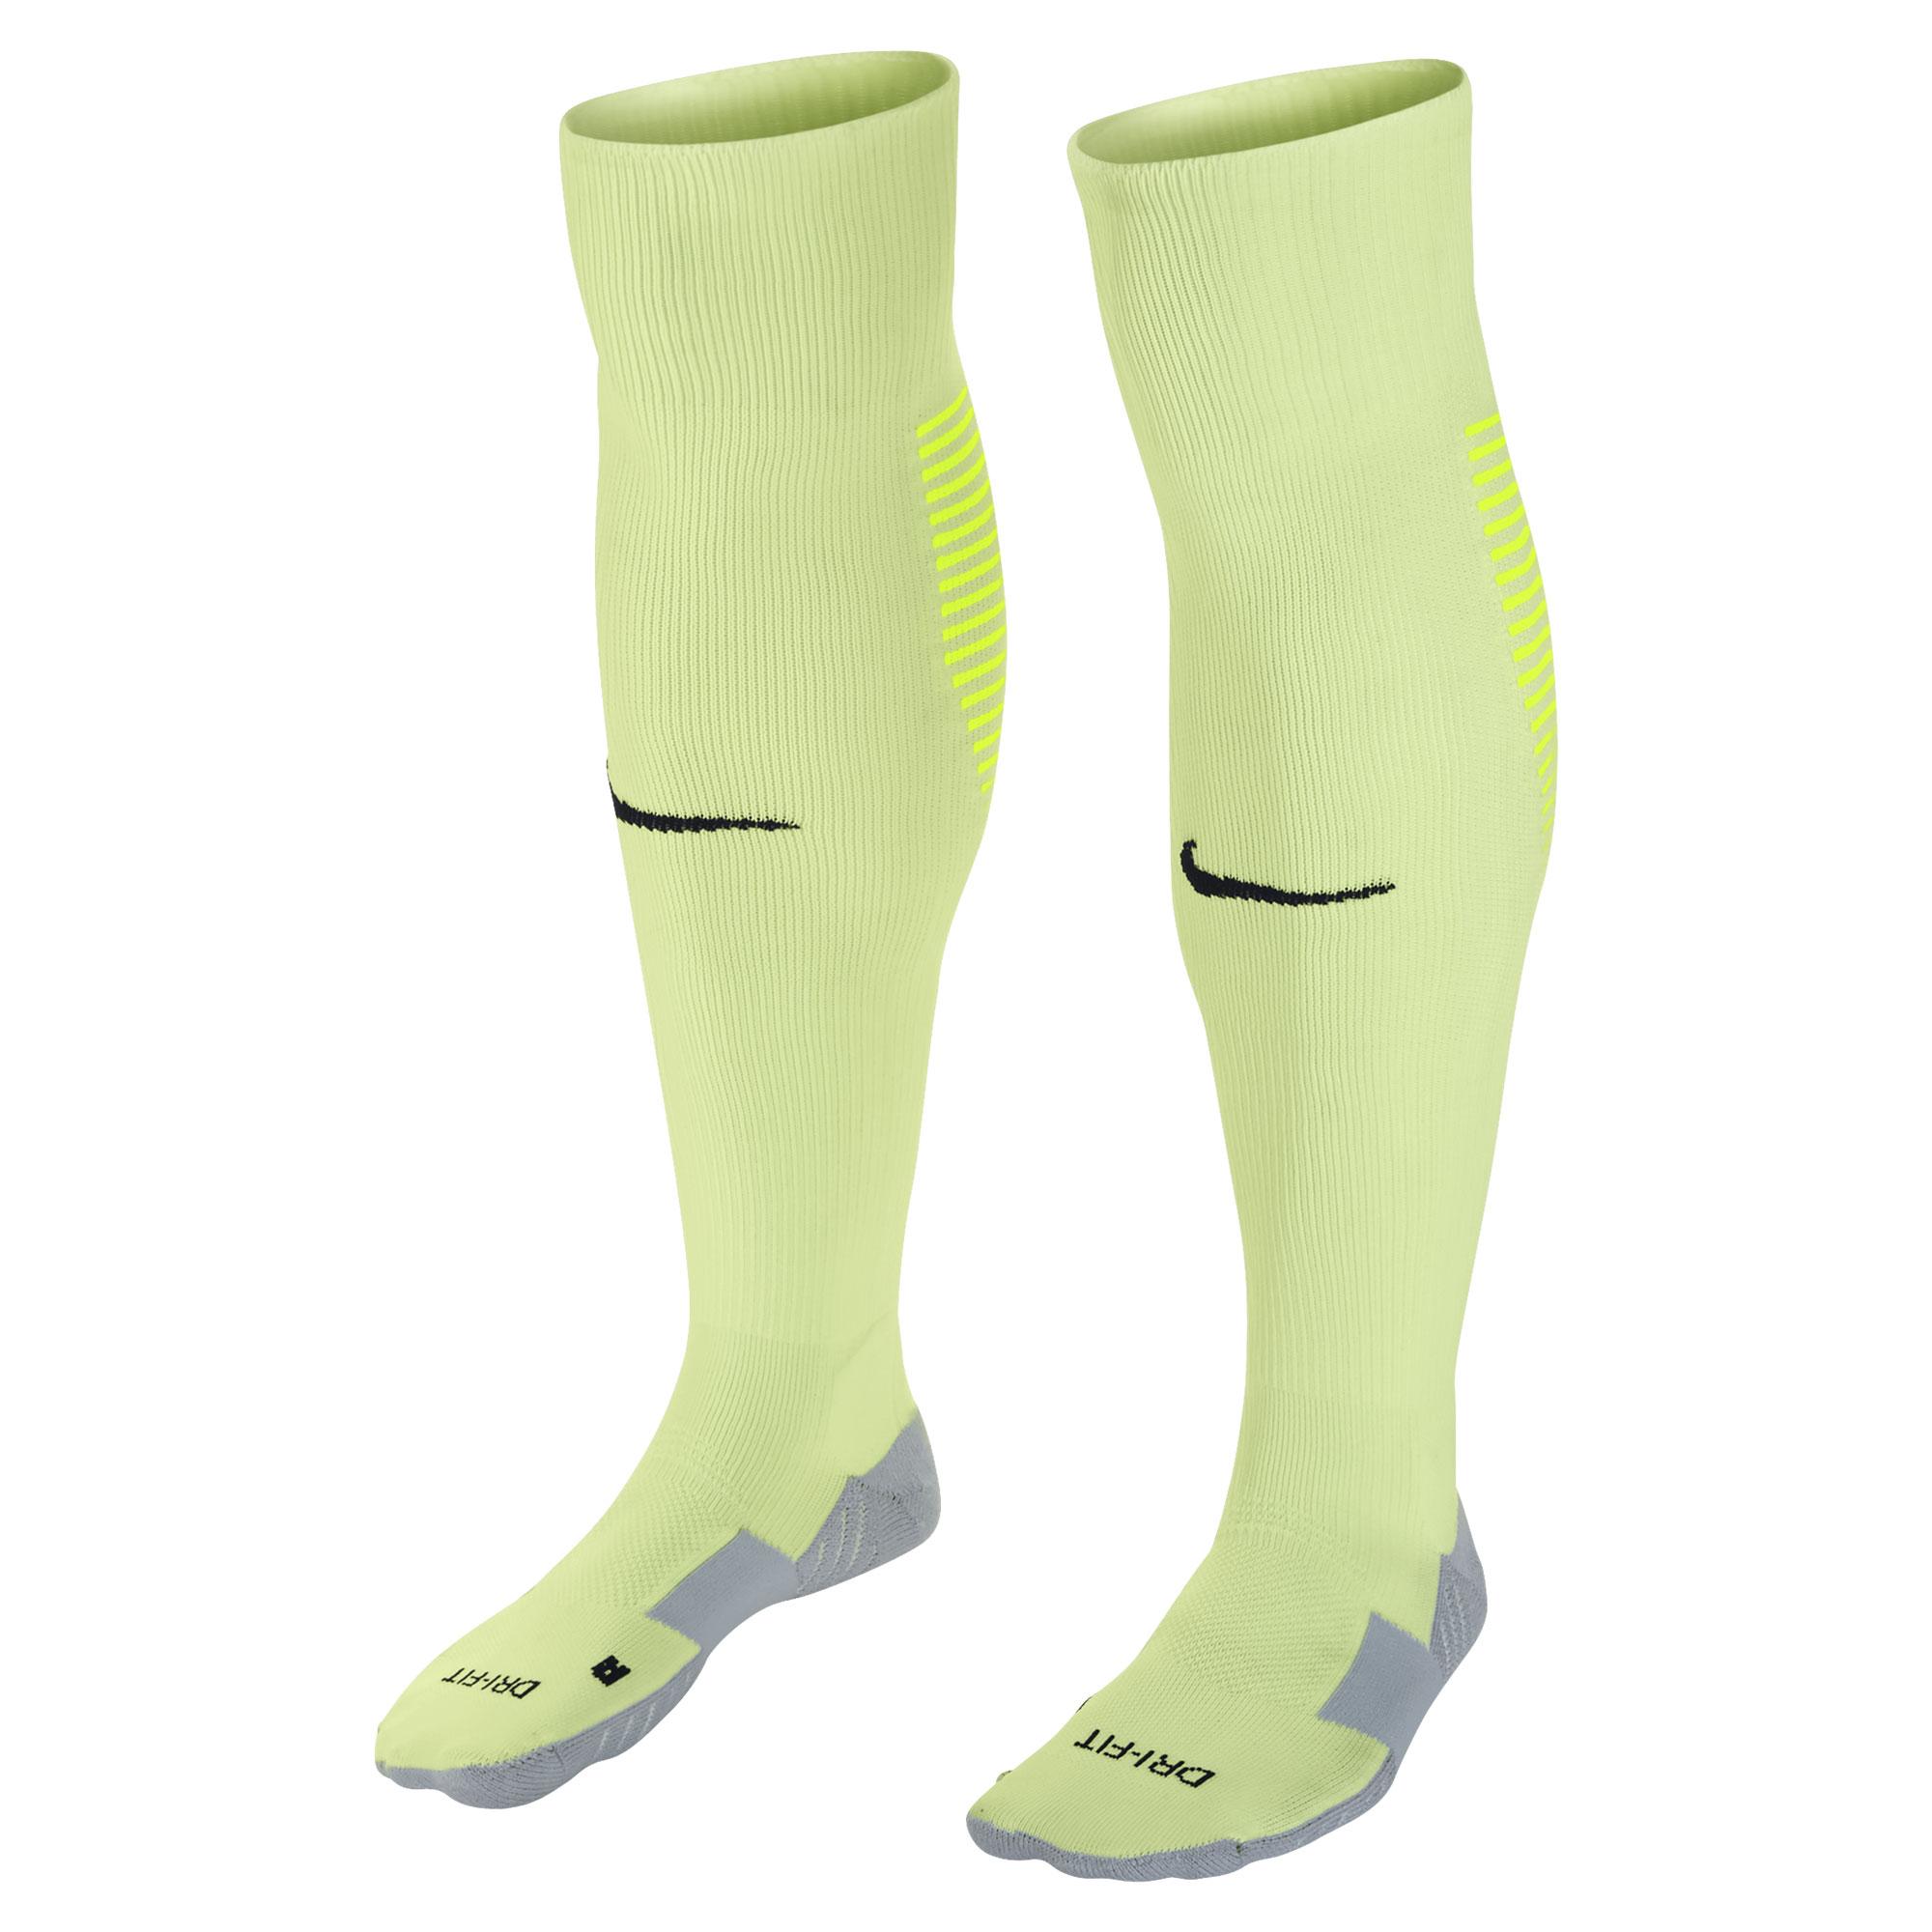 Nike Stutzen Team MatchFit OTC Football Socks SX5730-701 38-42